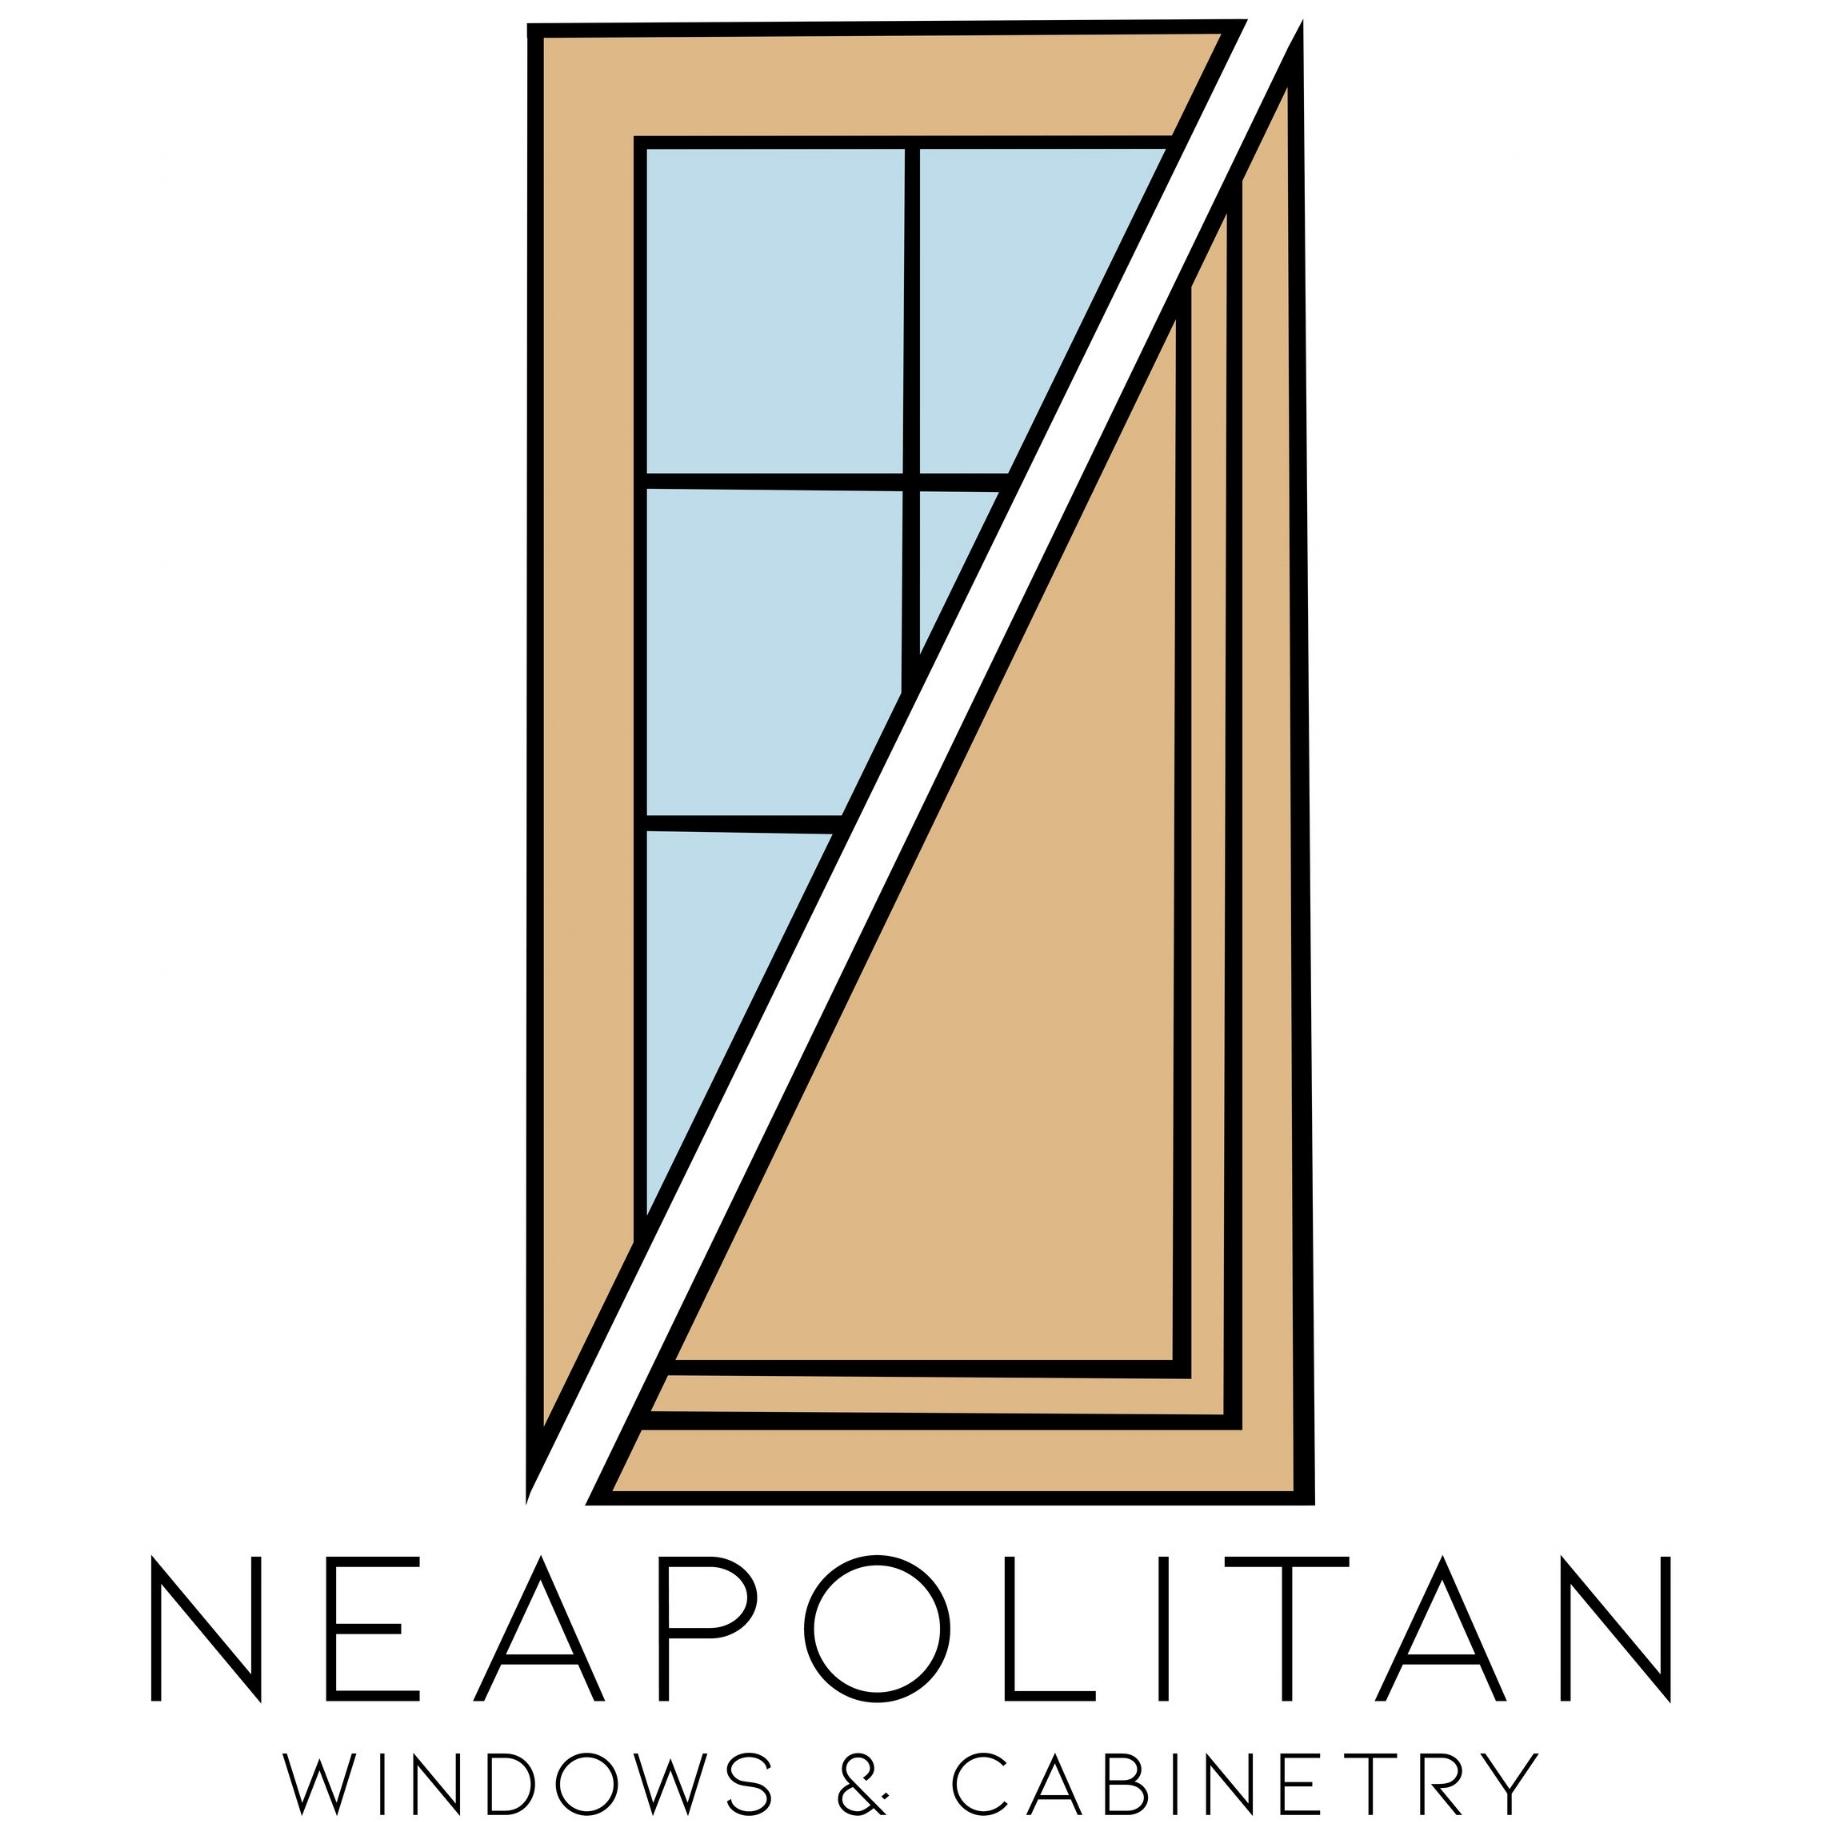 Neapolitan Windows & Cabinetry